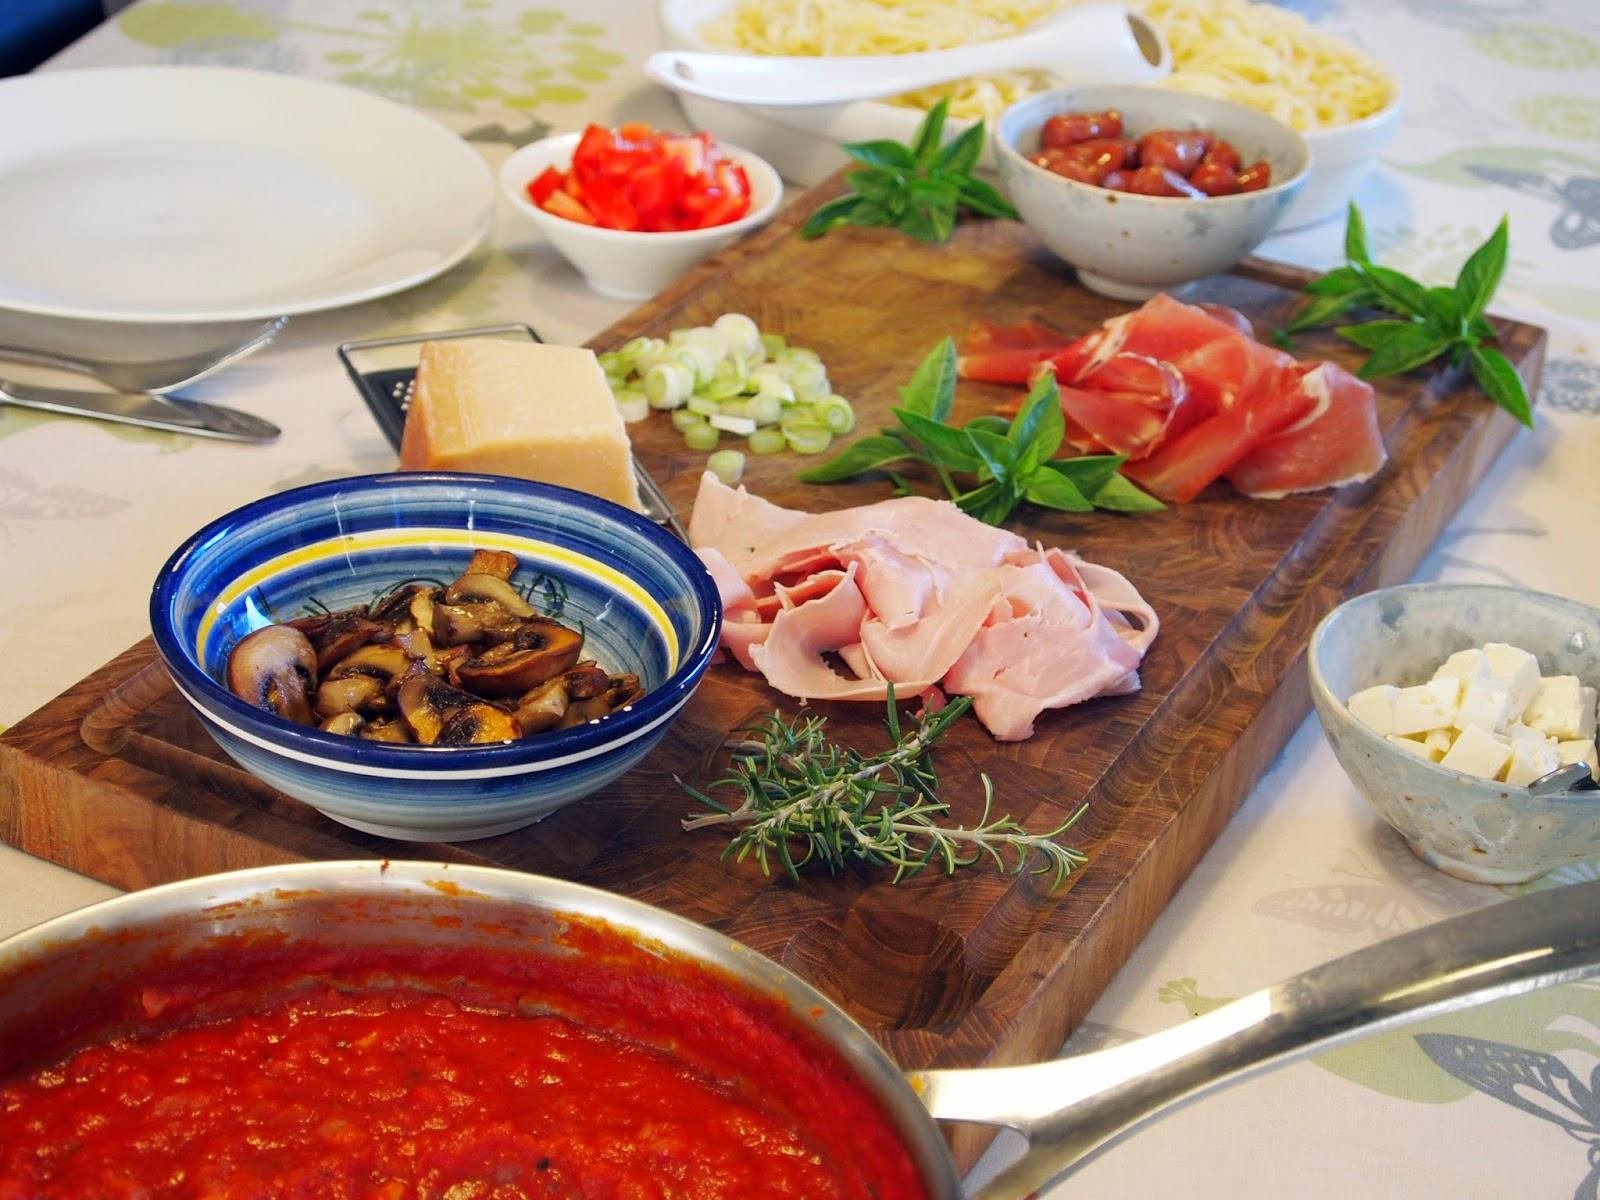 Ta' selv spaghetti | MadMedMartin